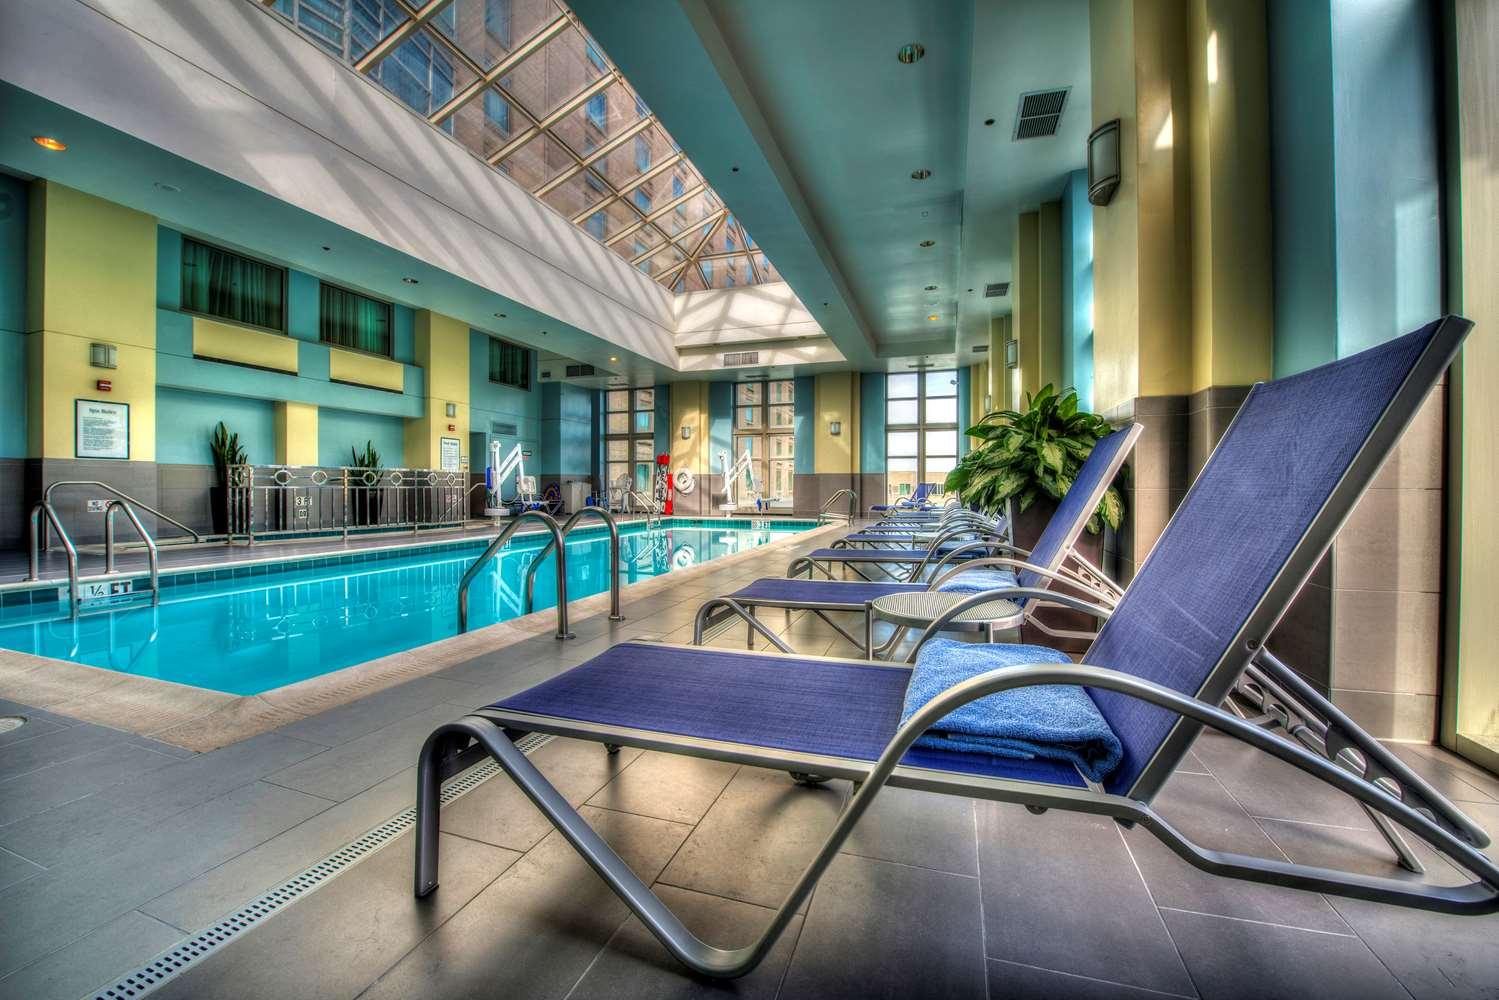 Pool Hyatt Regency Hotel Reston